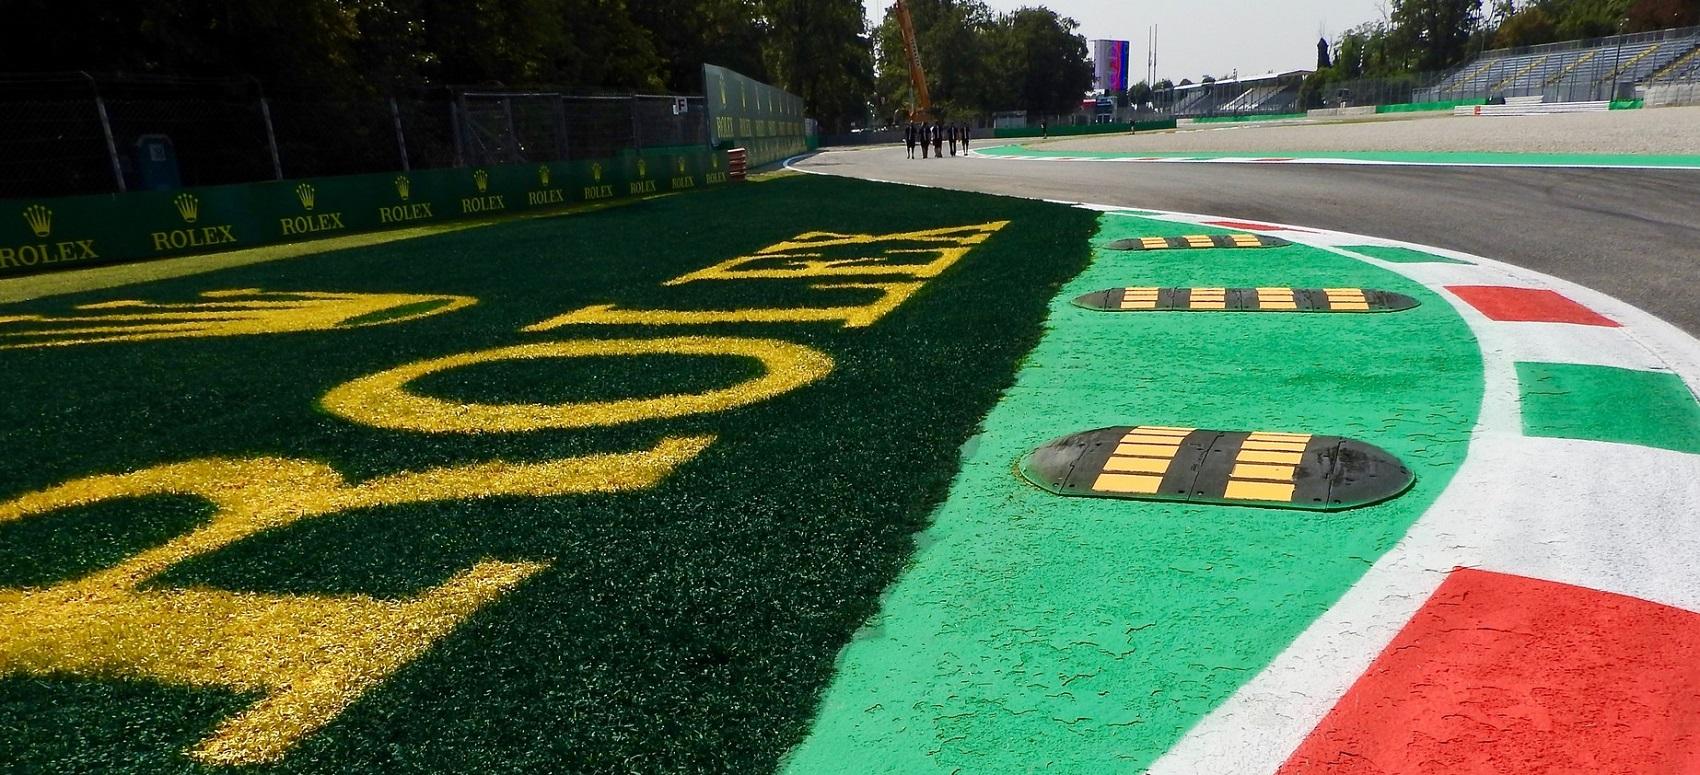 Monza, racingline, racinglinehu, racingline.hu, aci